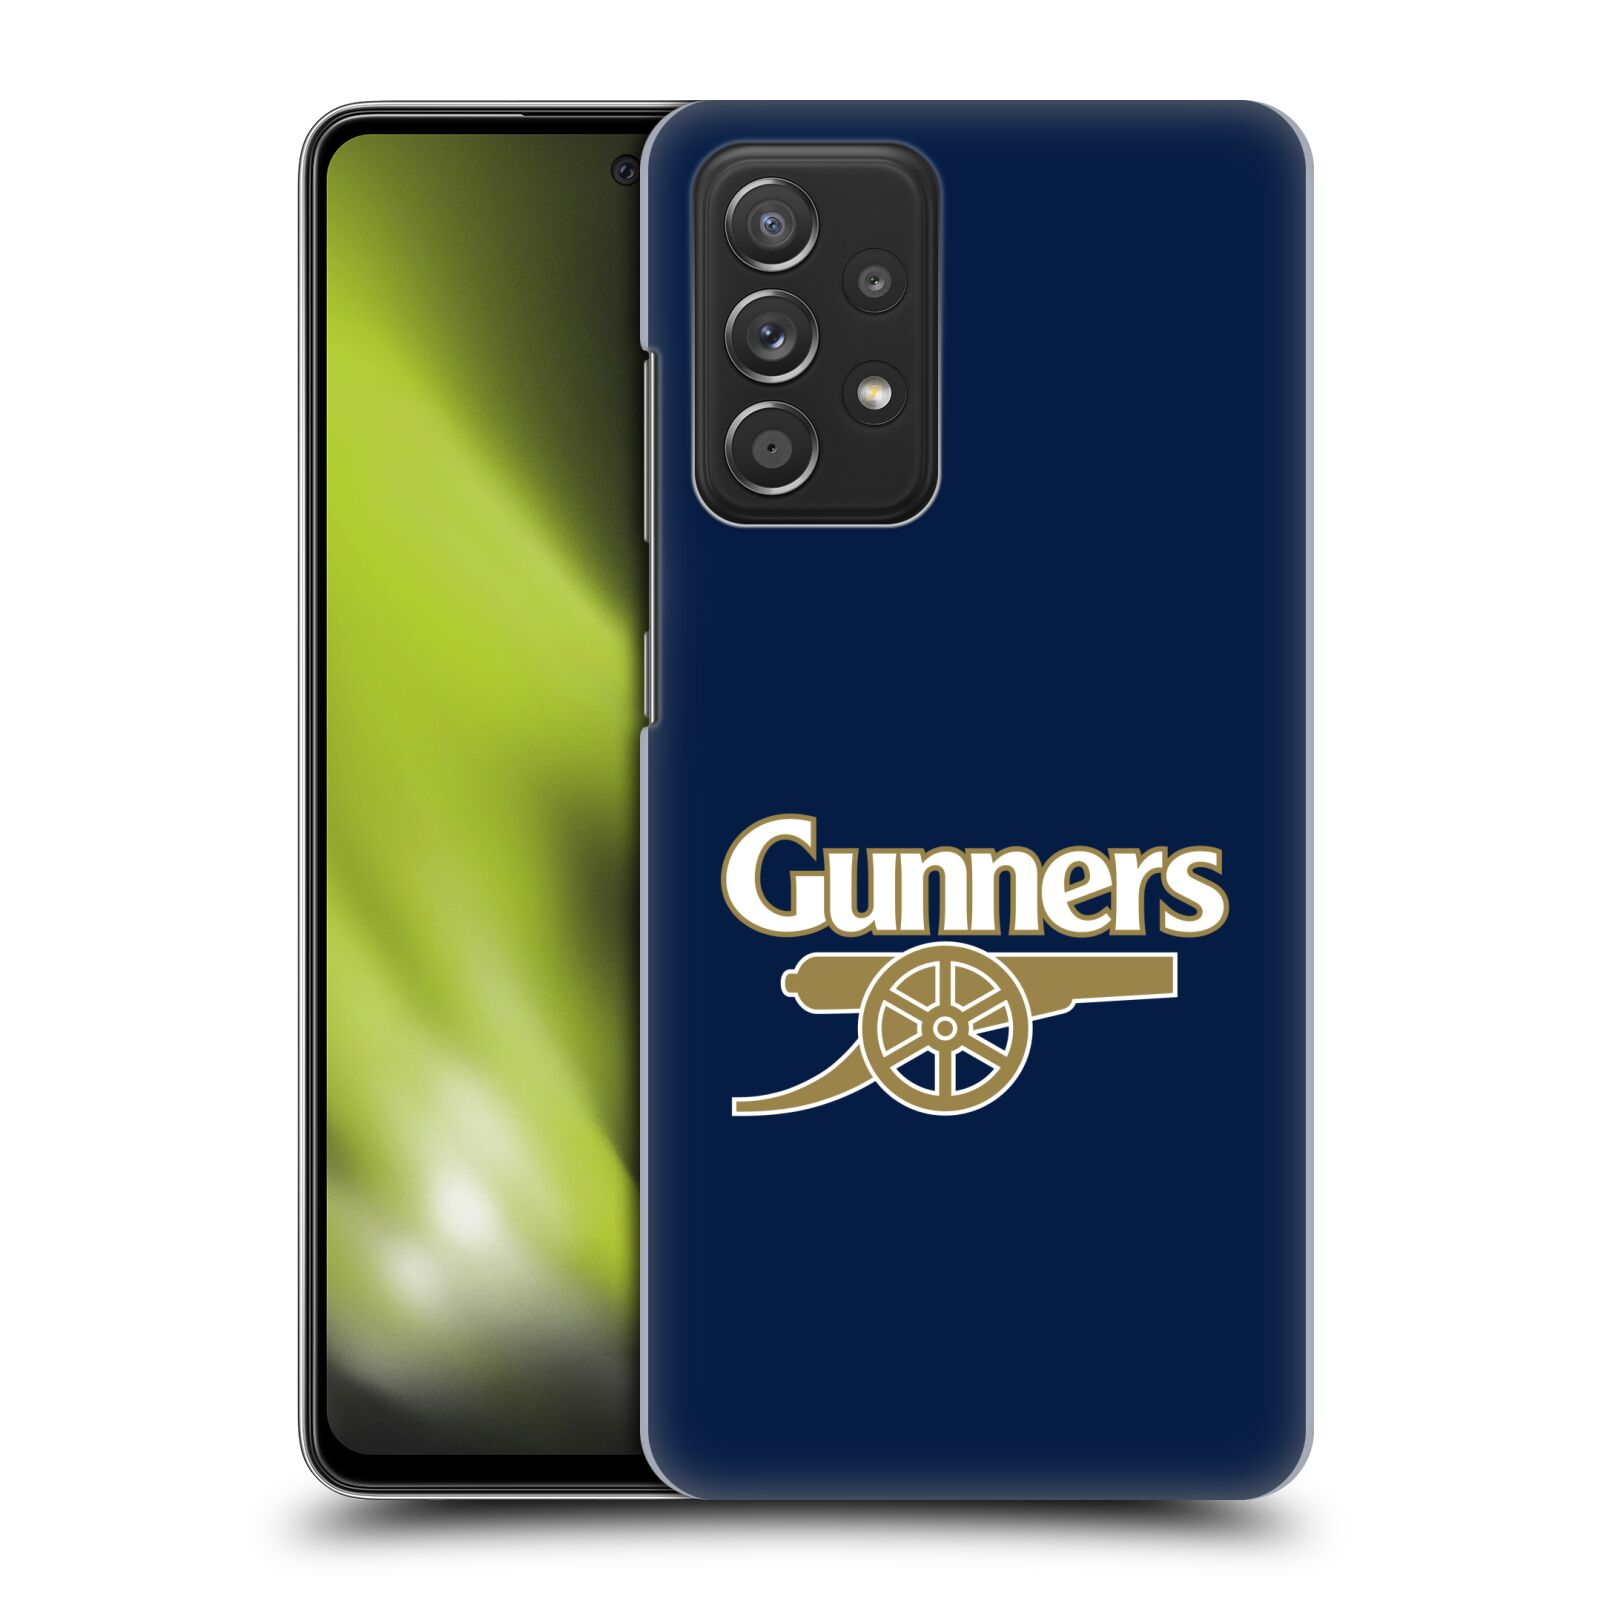 Plastové pouzdro na mobil Samsung Galaxy A52 / A52 5G / A52s 5G - Head Case - Arsenal FC - Gunners